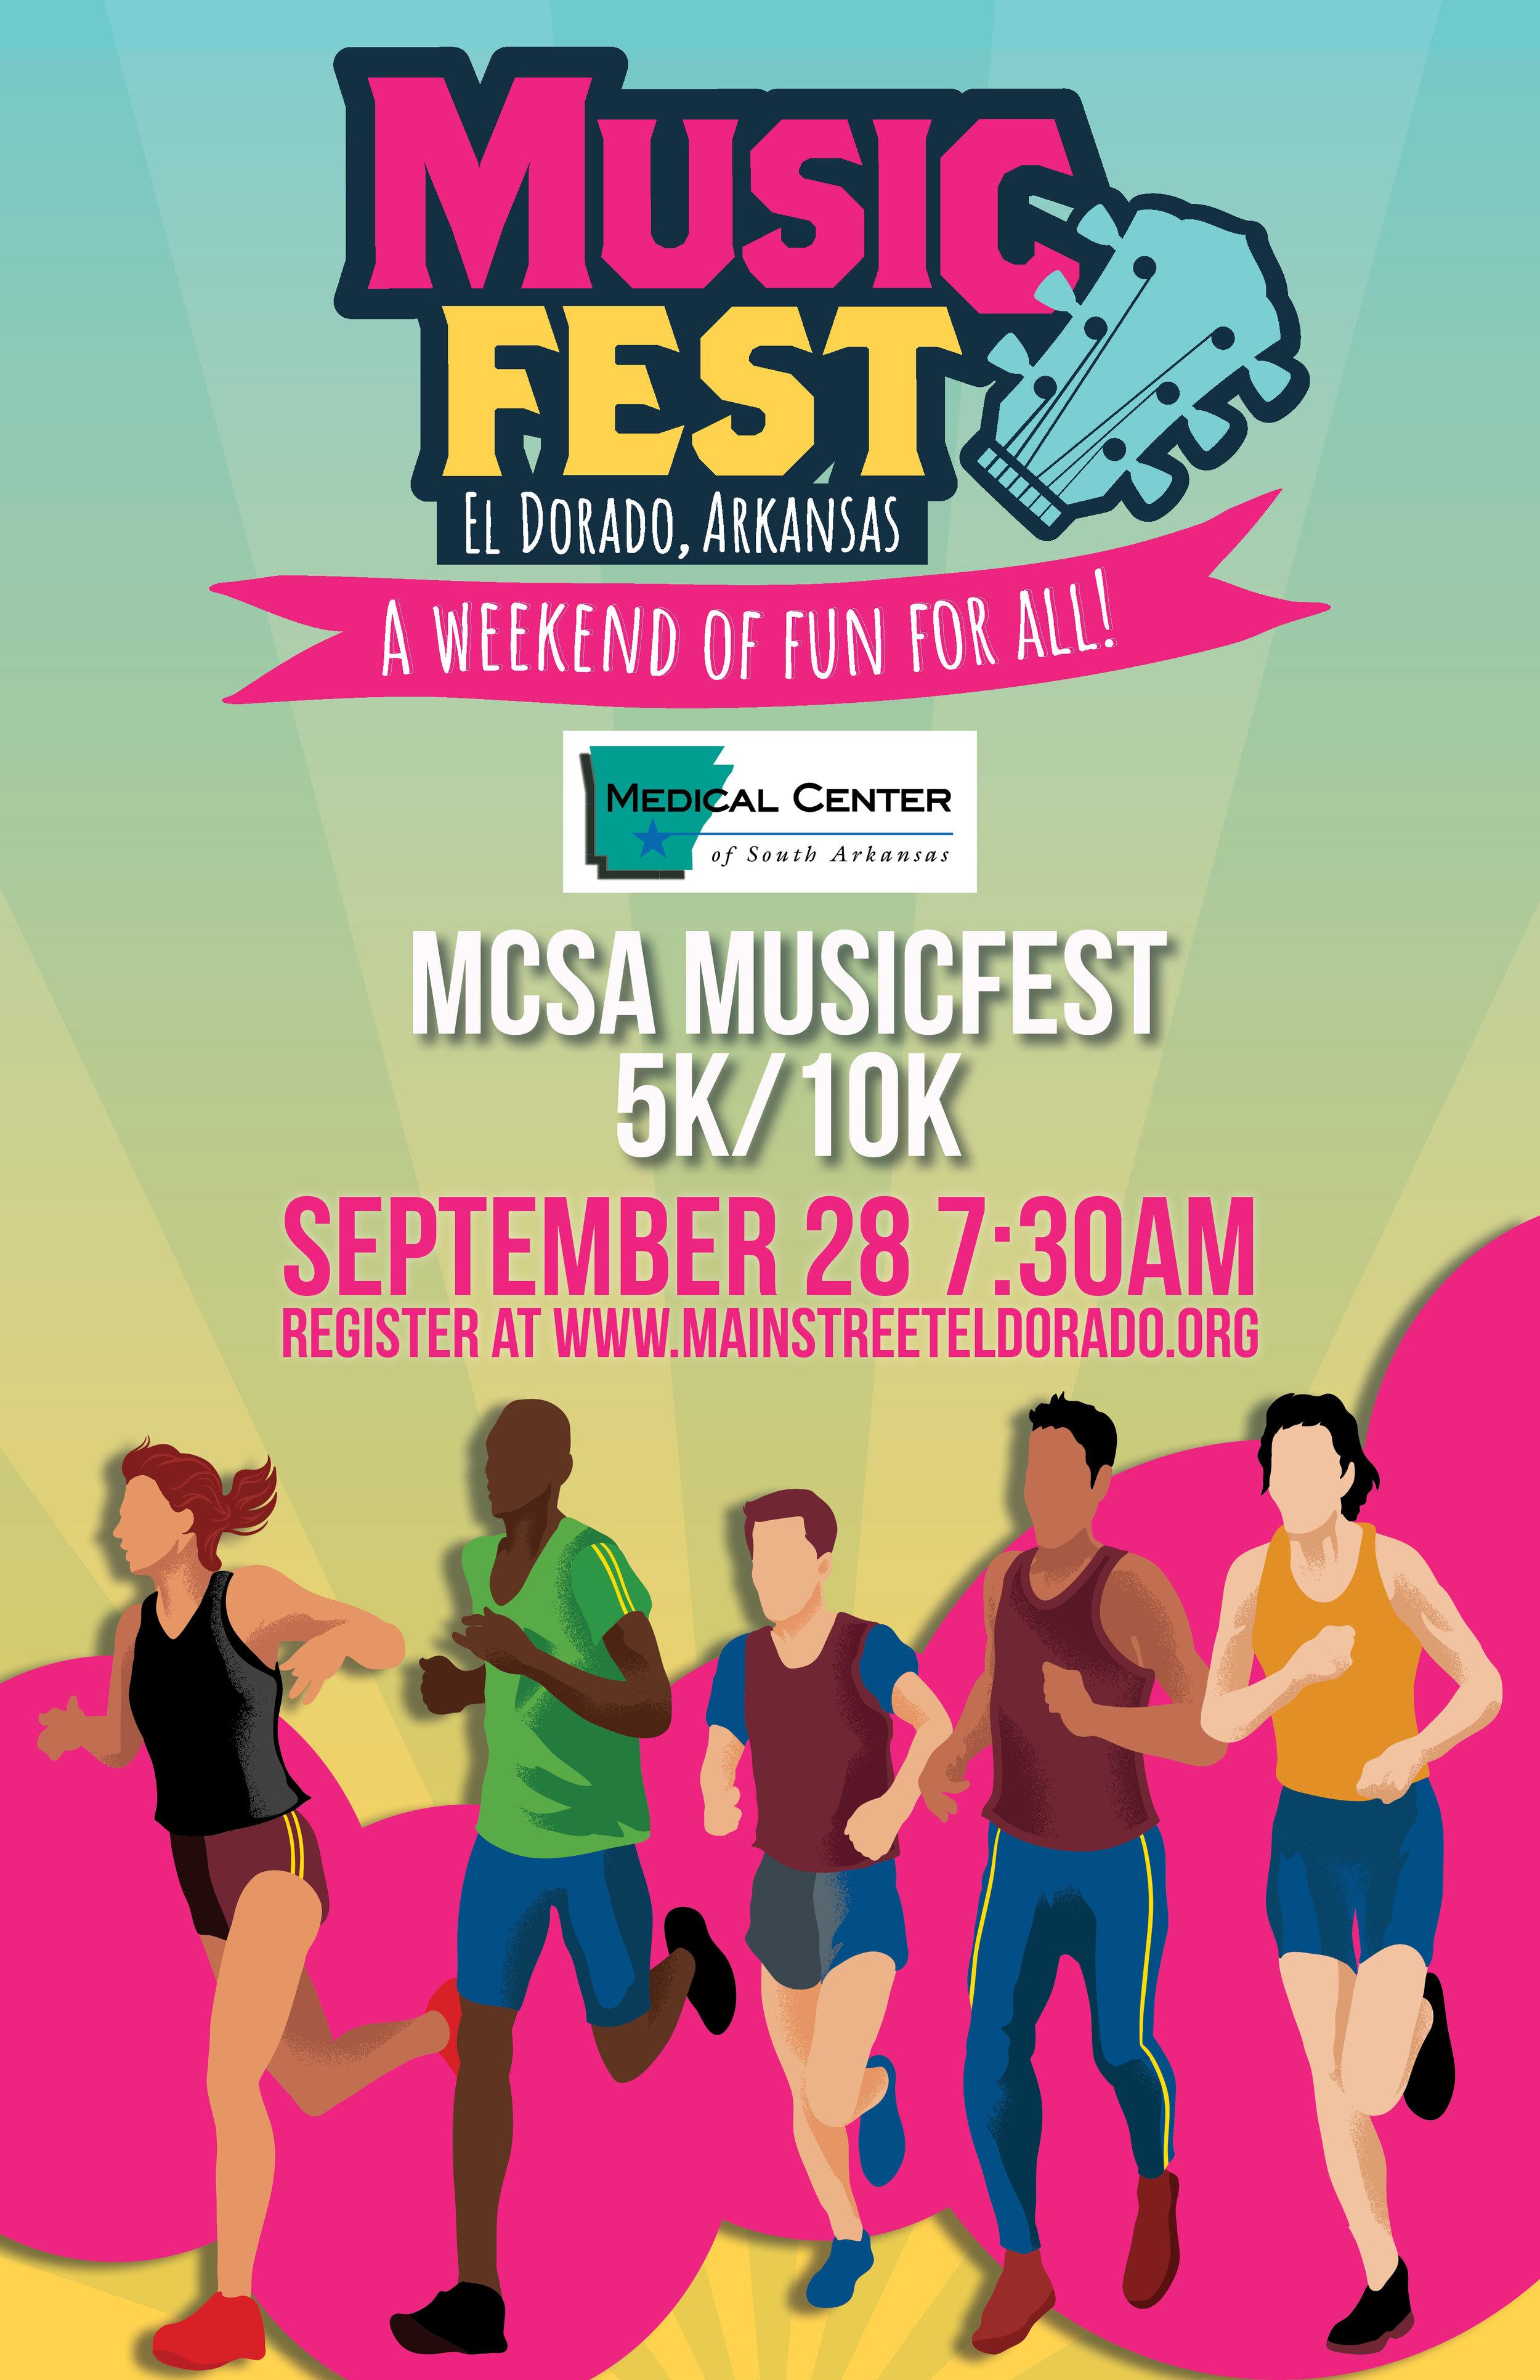 5K flyer with mcsa logo.jpg